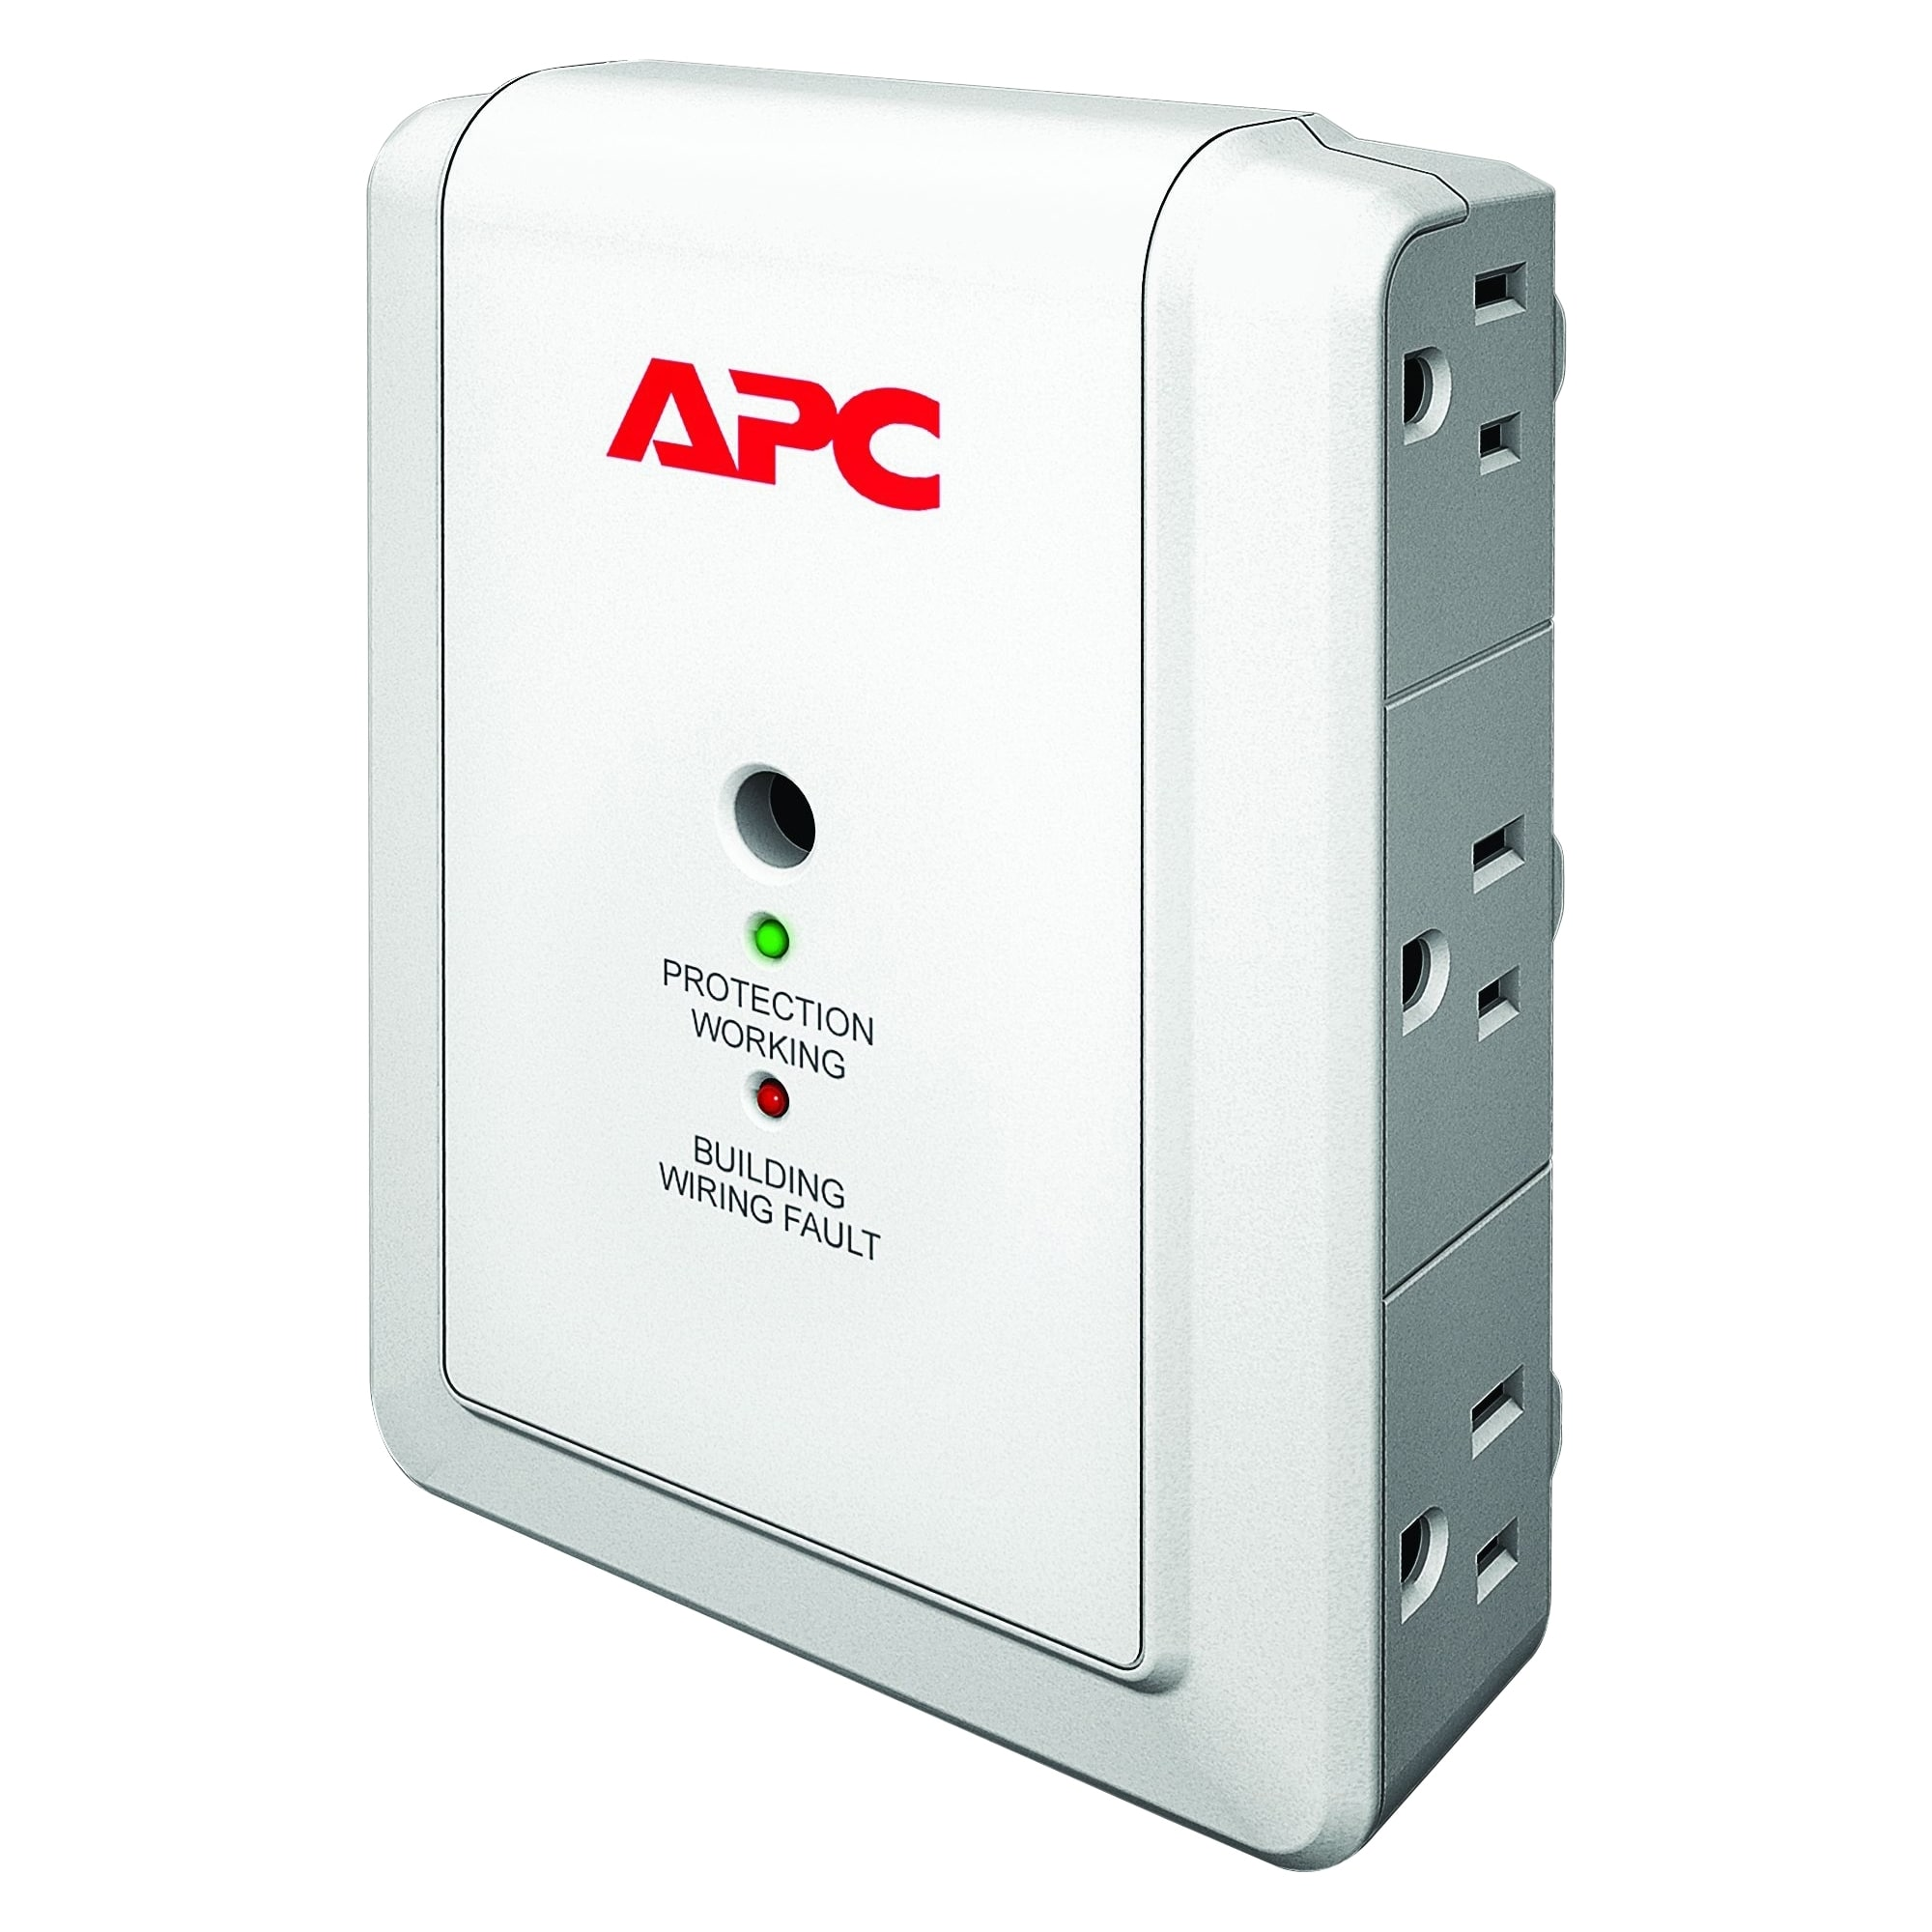 APC SurgeArrest Essential - surge protector